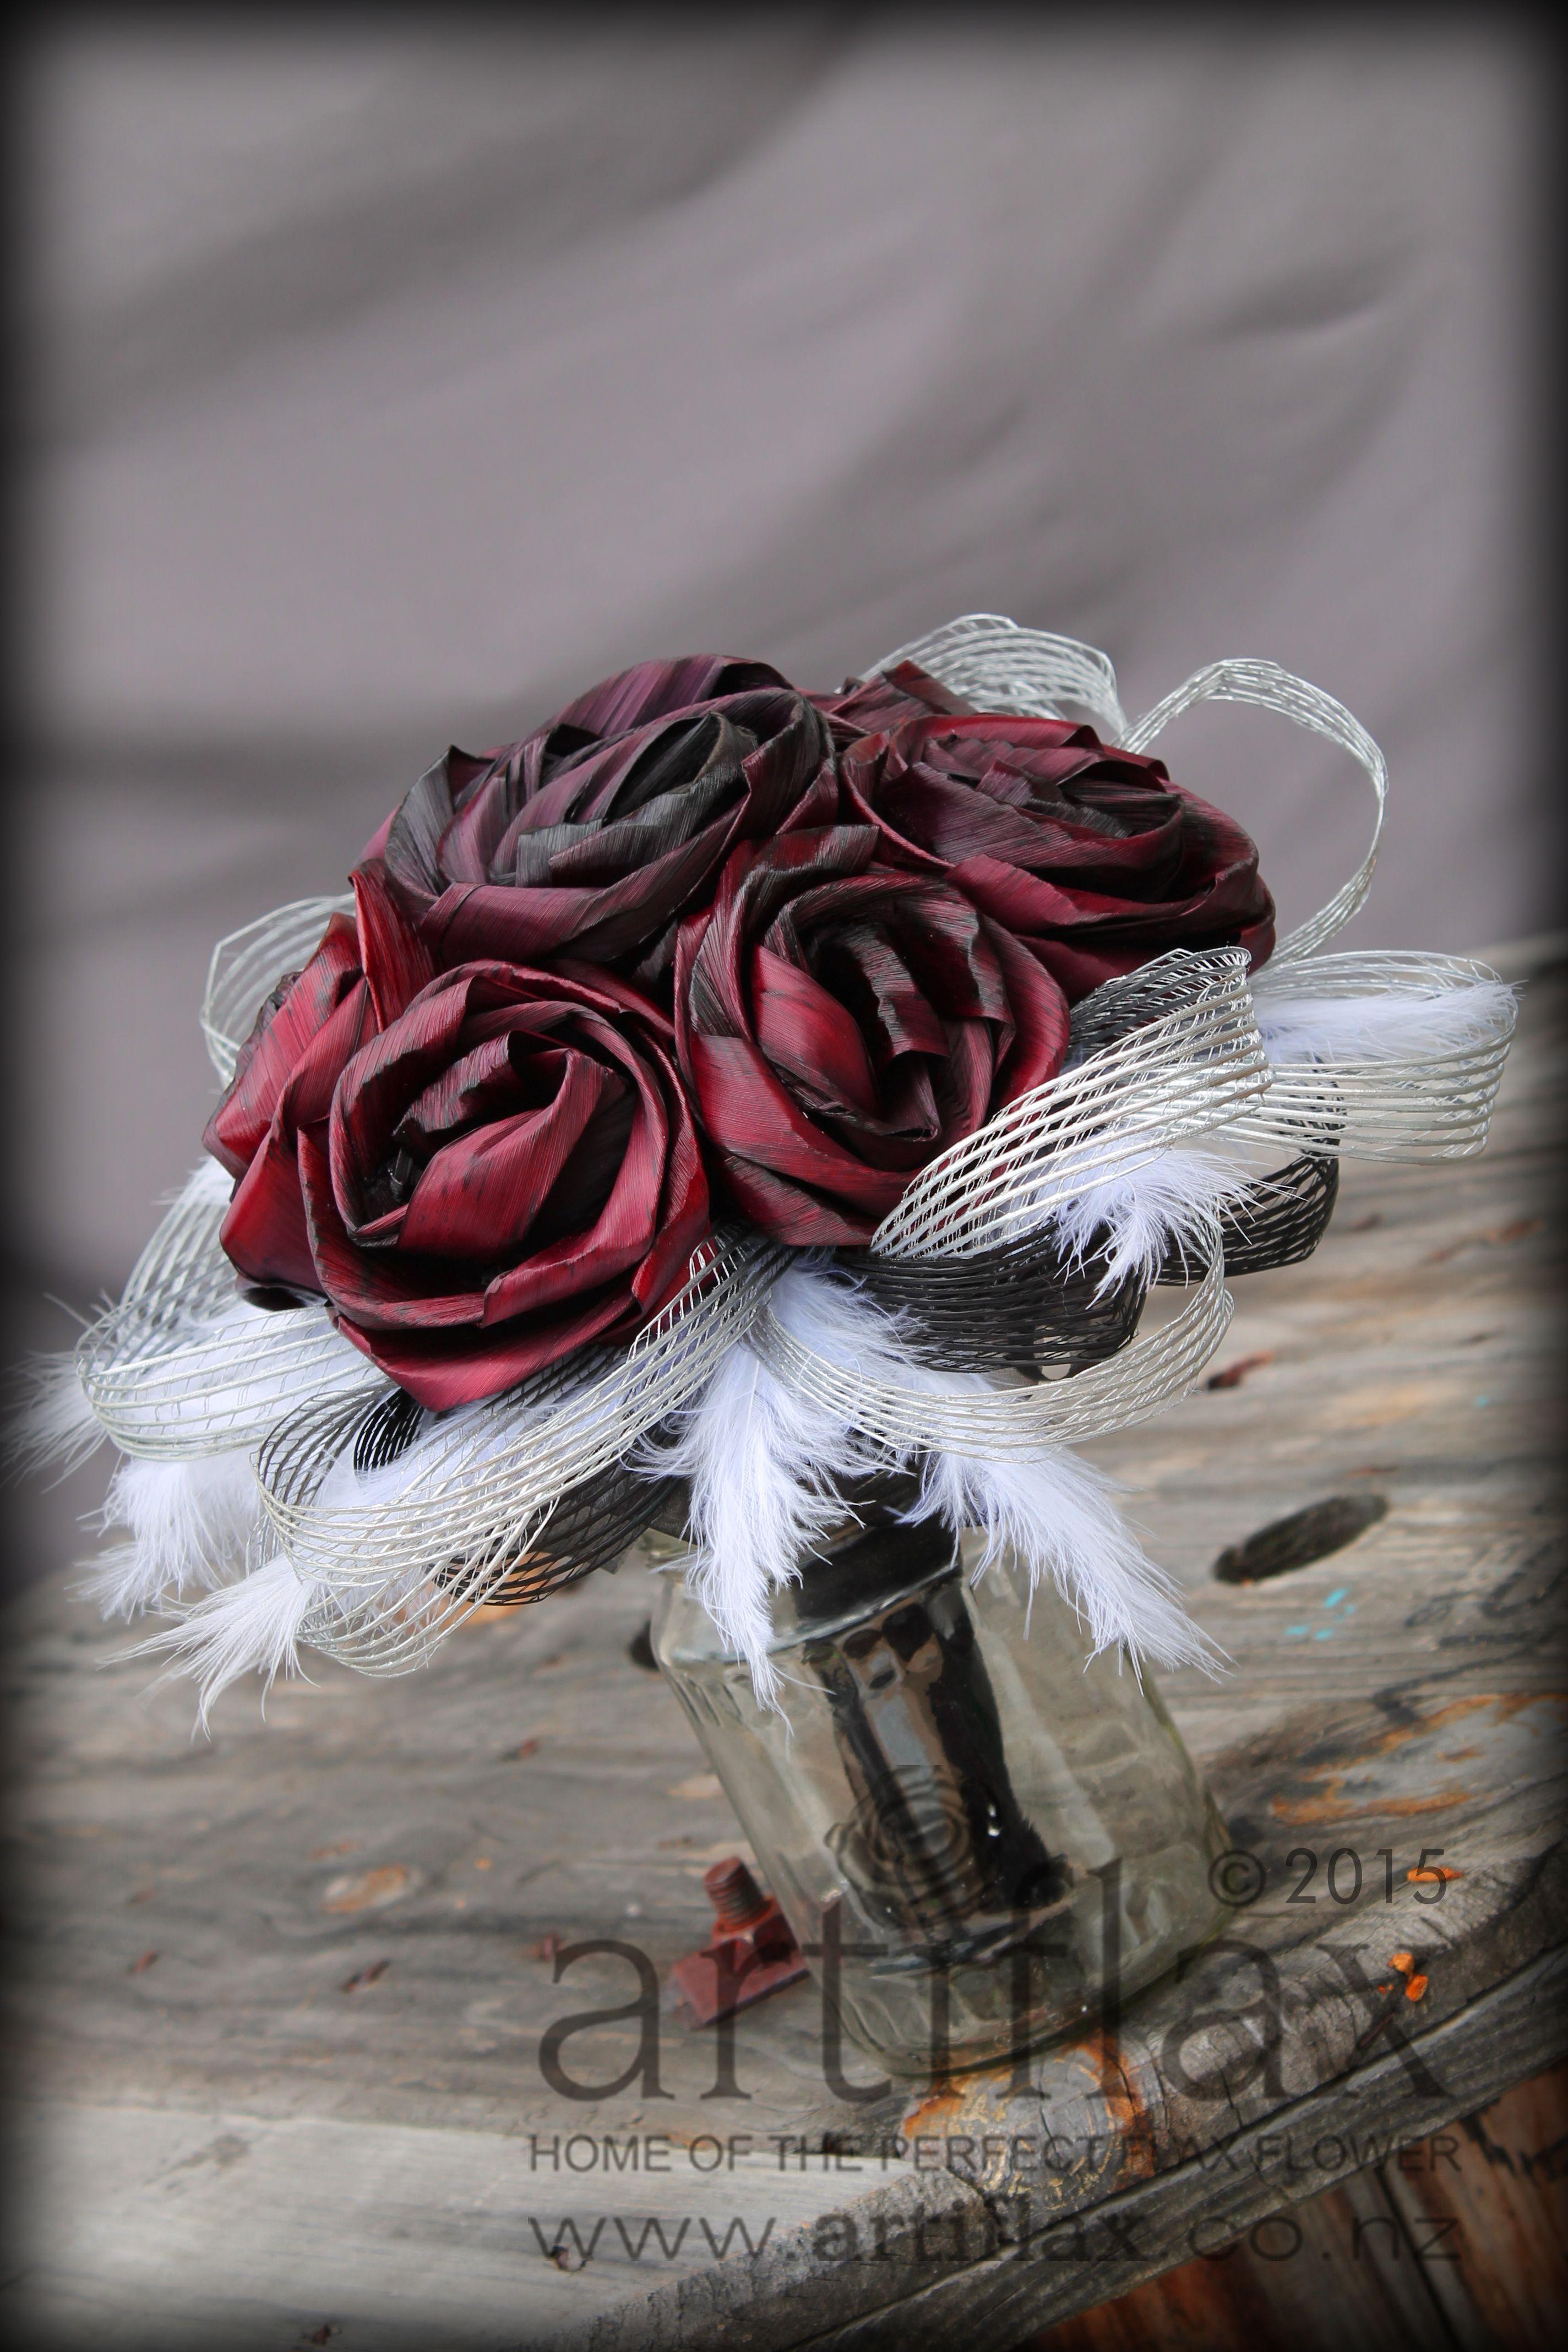 Flax Flower Bridal Bouquet By Artiflax Burgundy Flax Flowers With